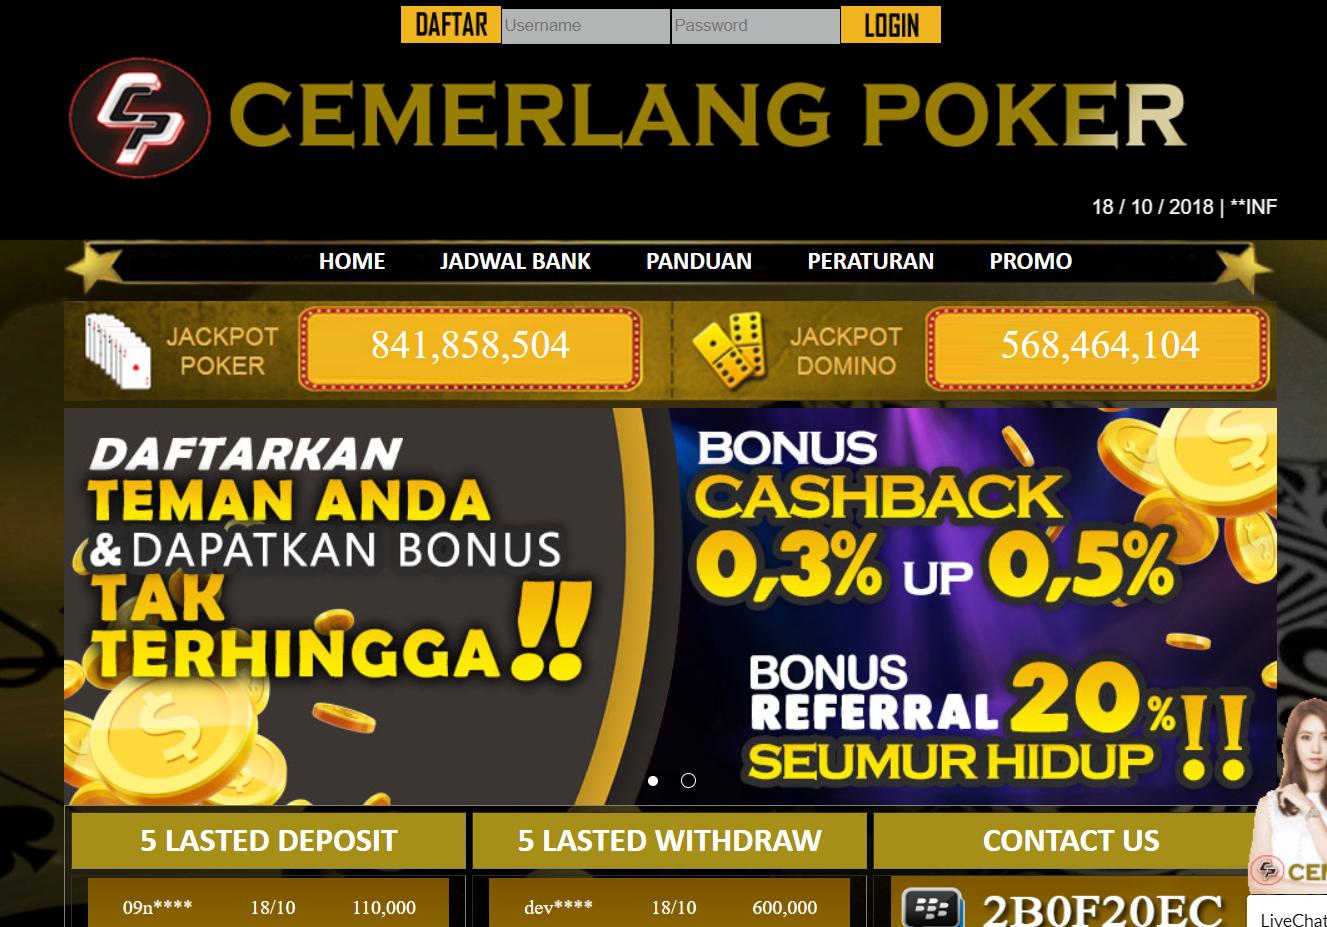 Daftar Cemerlangpoker Cemerlangpoker Cemerlang Poker Www Cemerlangpoker Com Cemerlangpoker Logi Poker Teman